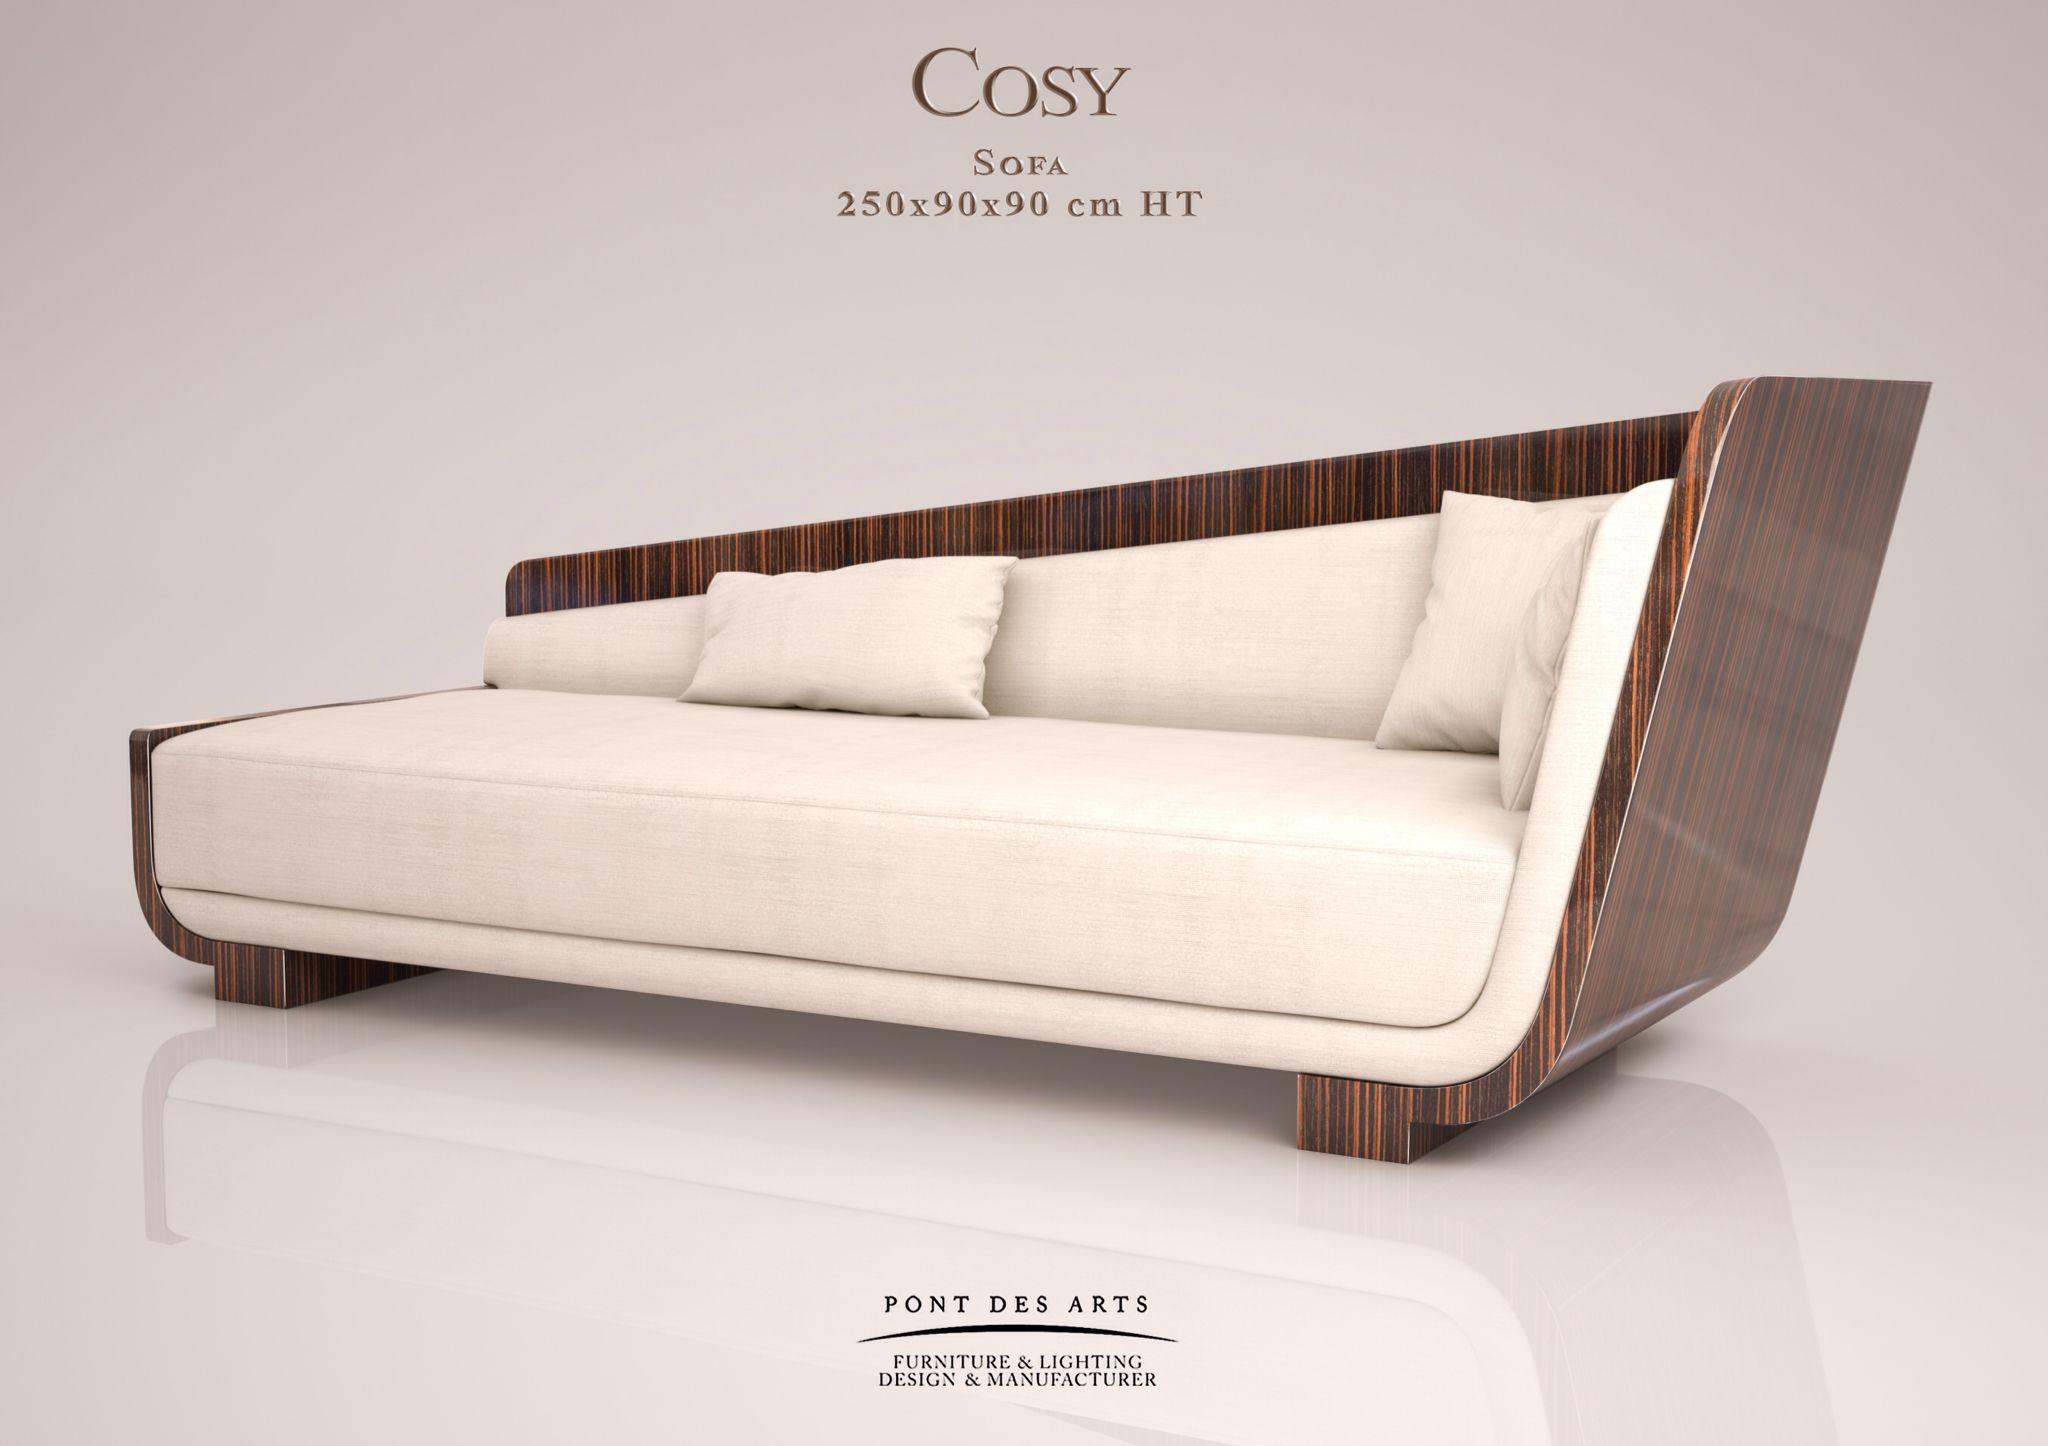 Cosy Sofa  Designer Monzer Hammoud  Pont Des Arts